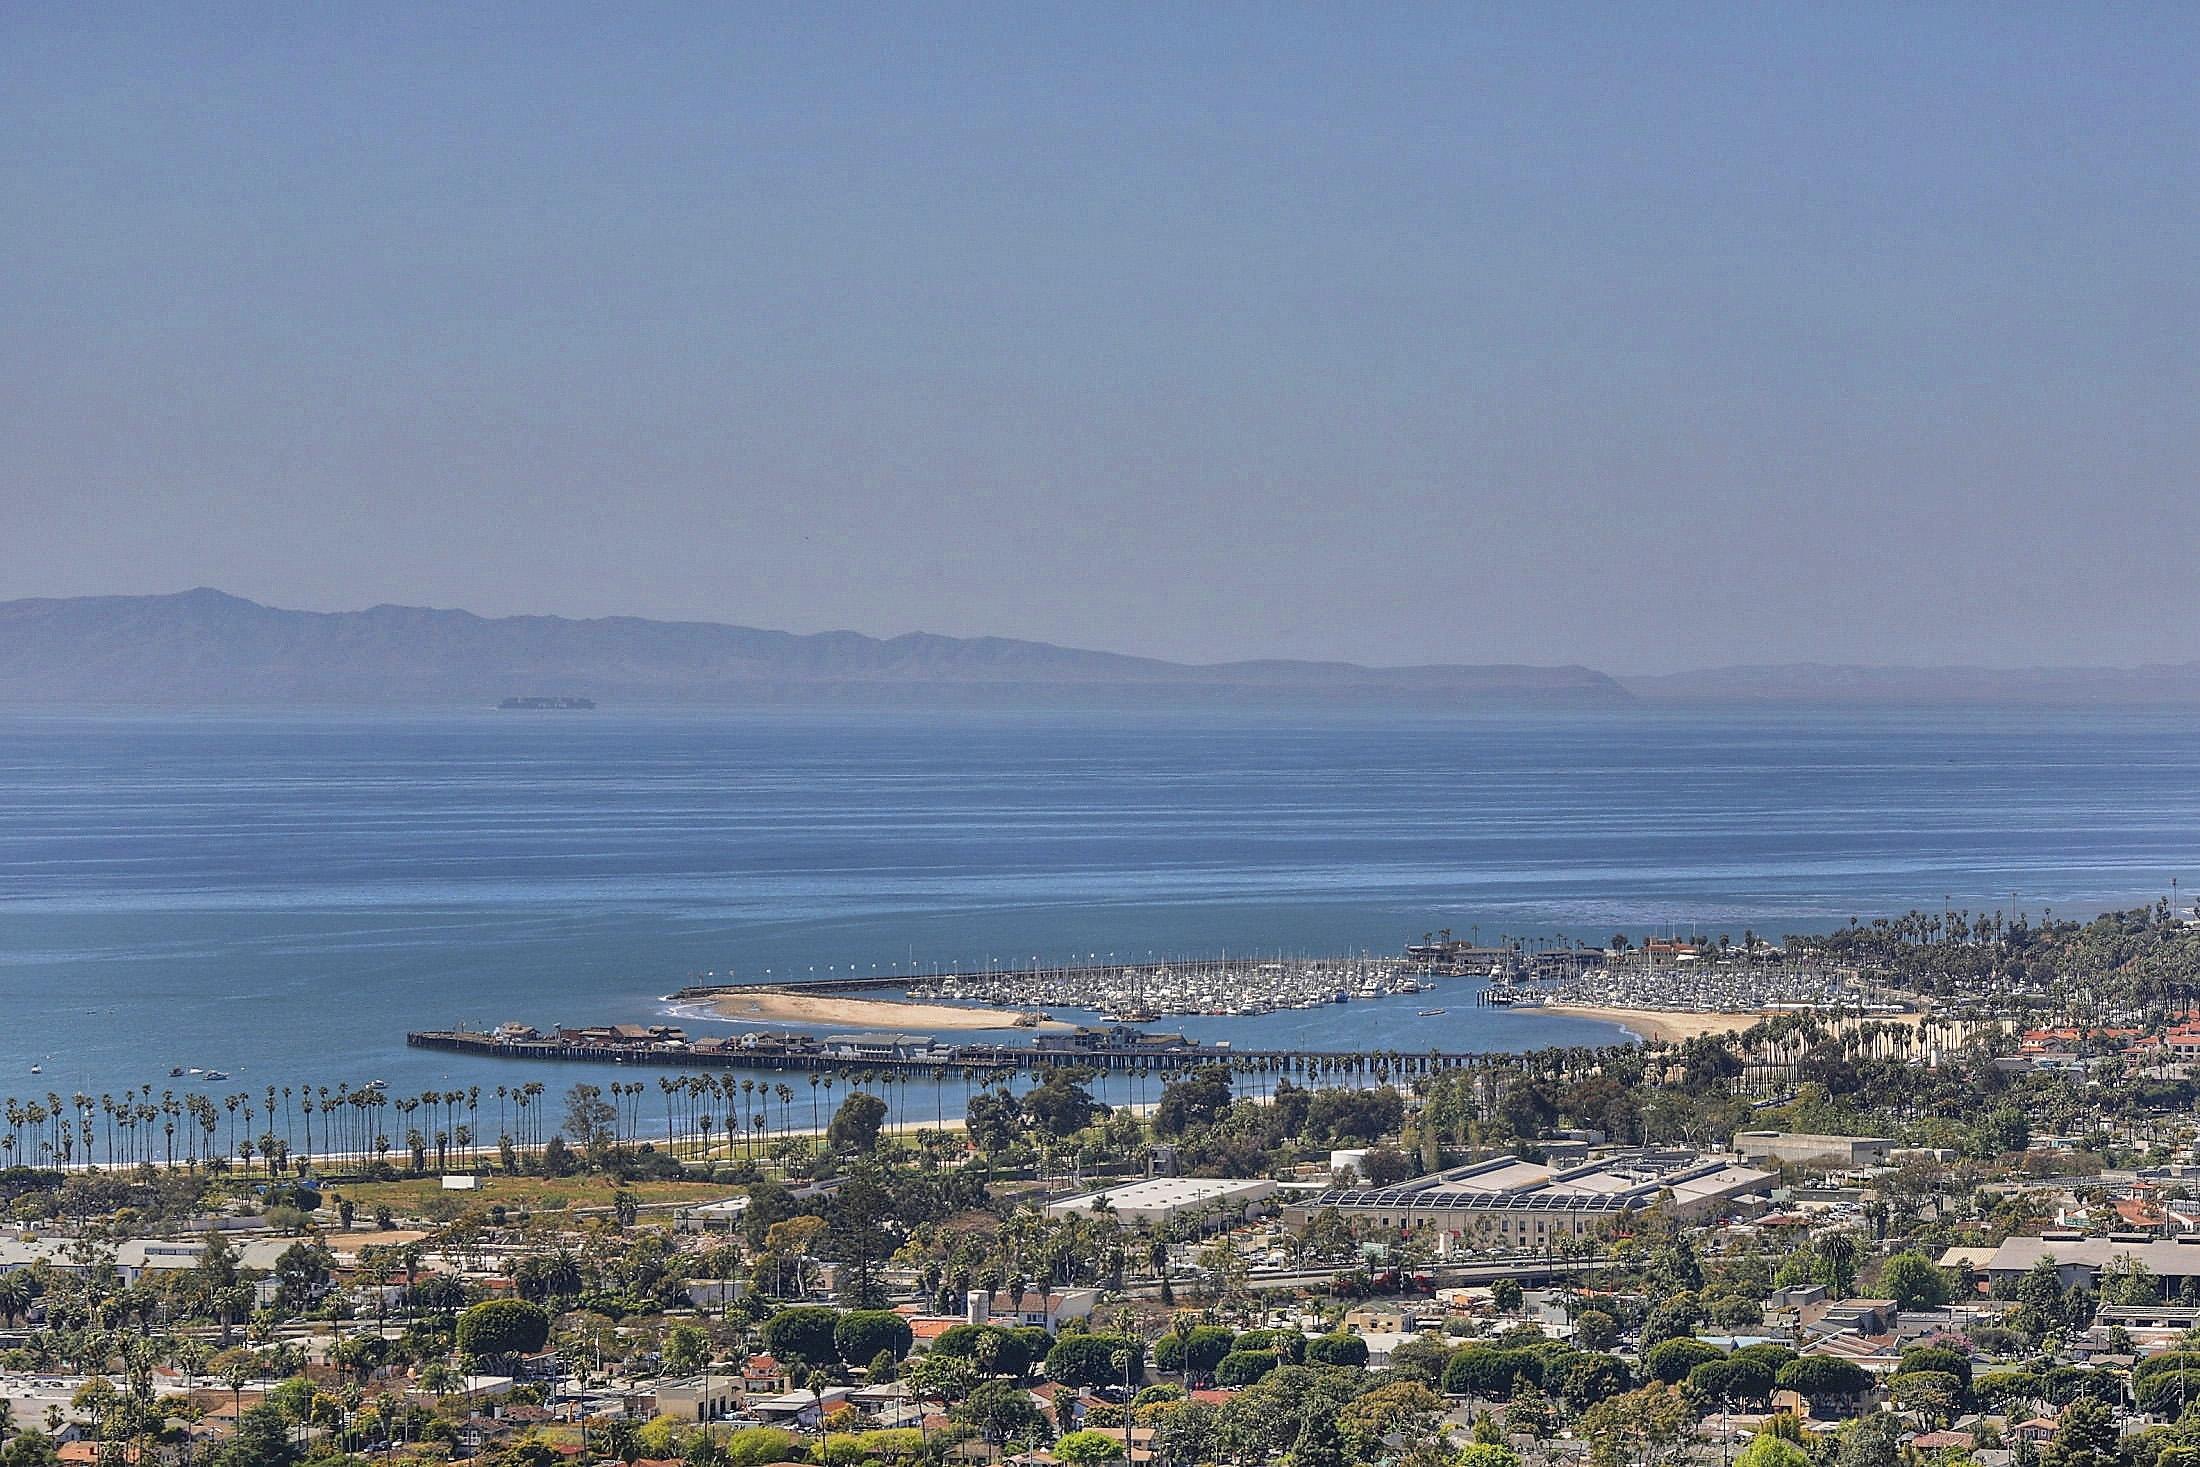 Property photo for 25 Via Alicia Santa Barbara, California 93108 - 13-1320